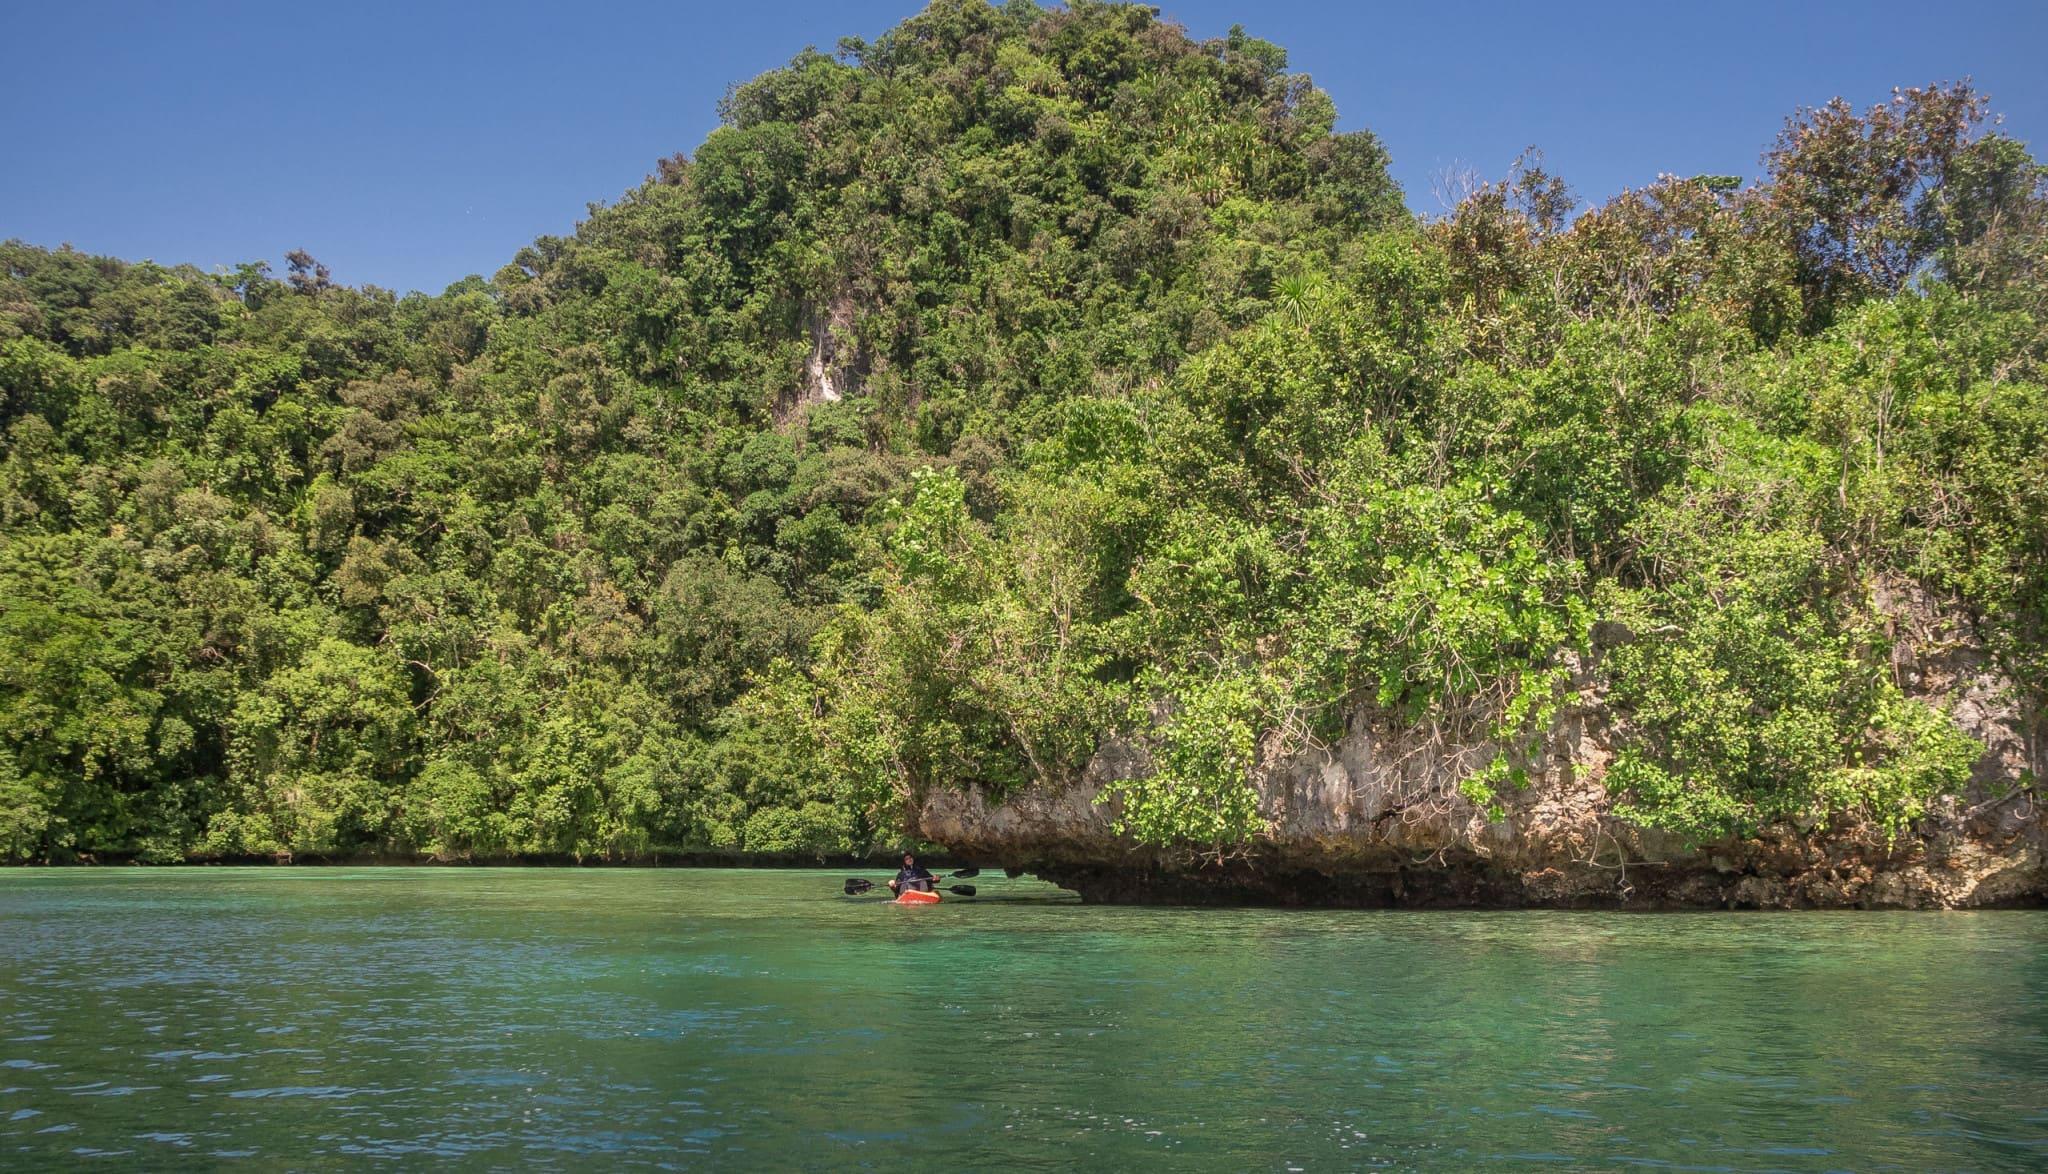 PALAU - Exploring Palau's Rock Islands by kayak & snorkeling in a hidden lake